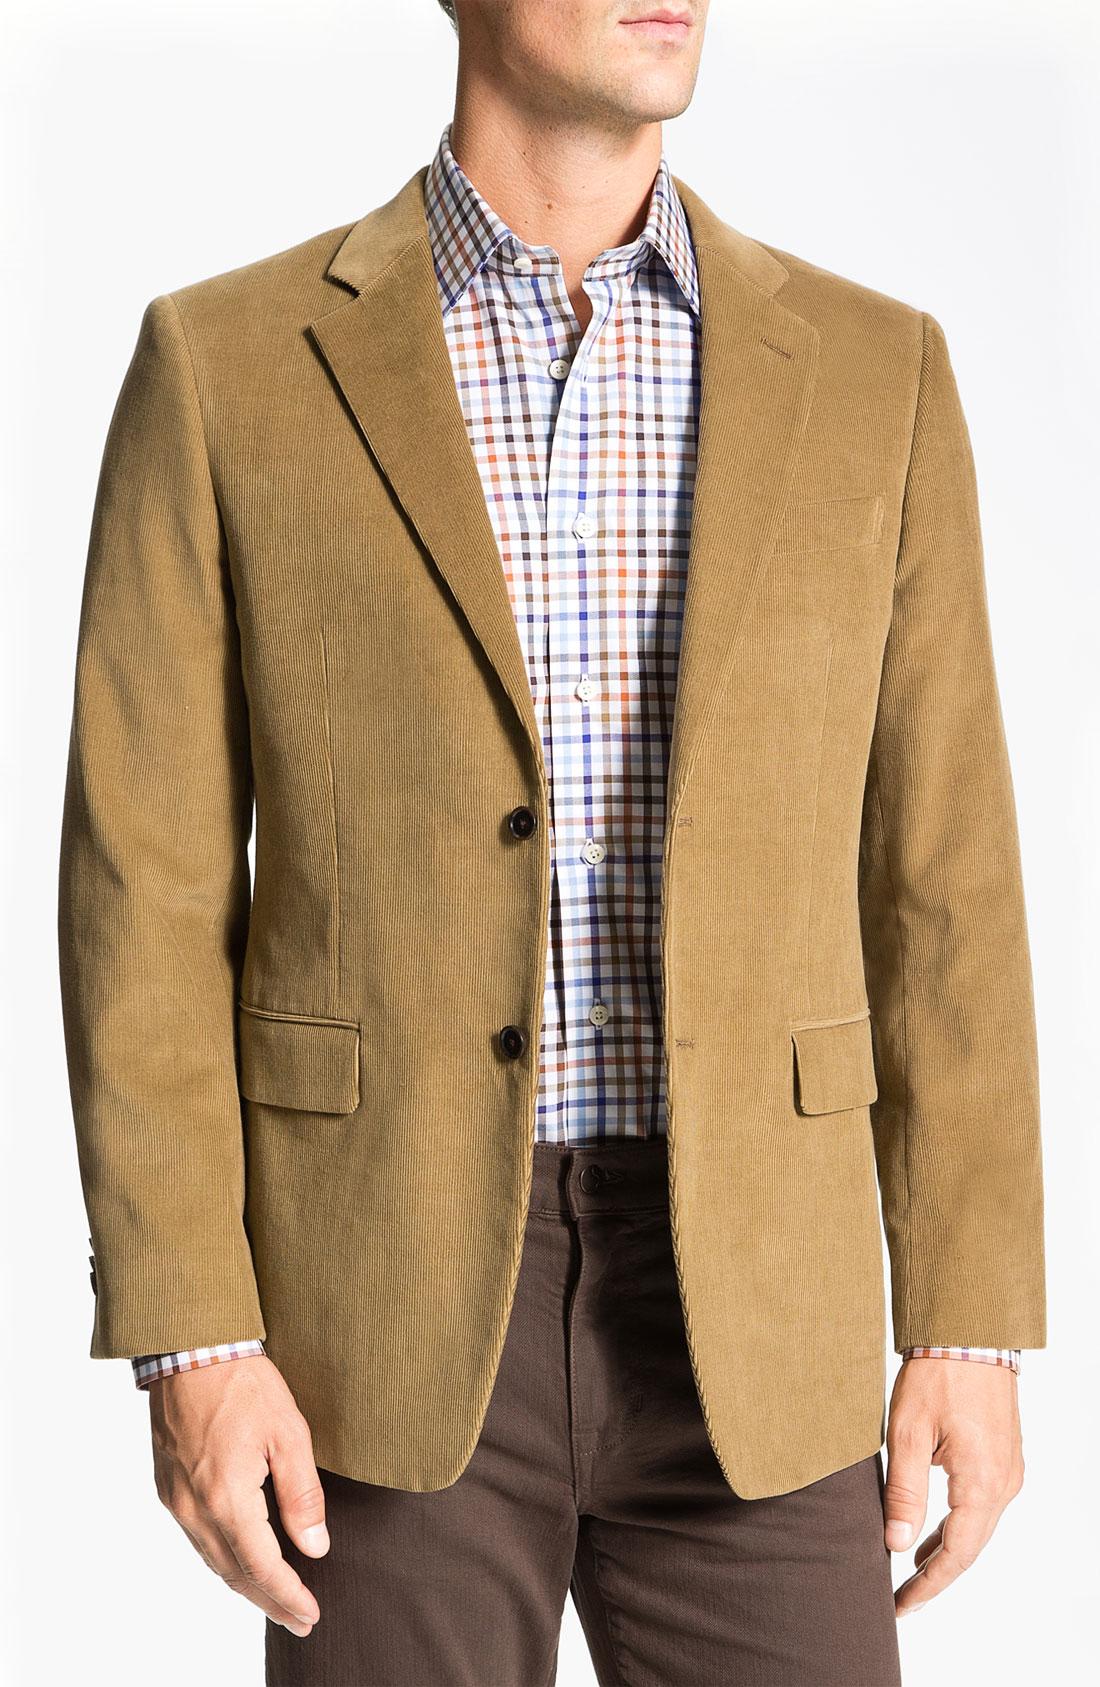 NWT Ralph Lauren Brown Corduroy Suit Jacket - Men's Size 44 Long Paisley Lining. $ +$ shipping. Make Offer. NWOT, MEN'S SPORT COAT BLAZER SUIT JACKET NAVY & STRIPED SIZE 42 R. $ +$ shipping. Make Offer. Ralph Lauren Polo Mens 40 R Black Corduroy Two Button Blazer Jacket Sport Coat.